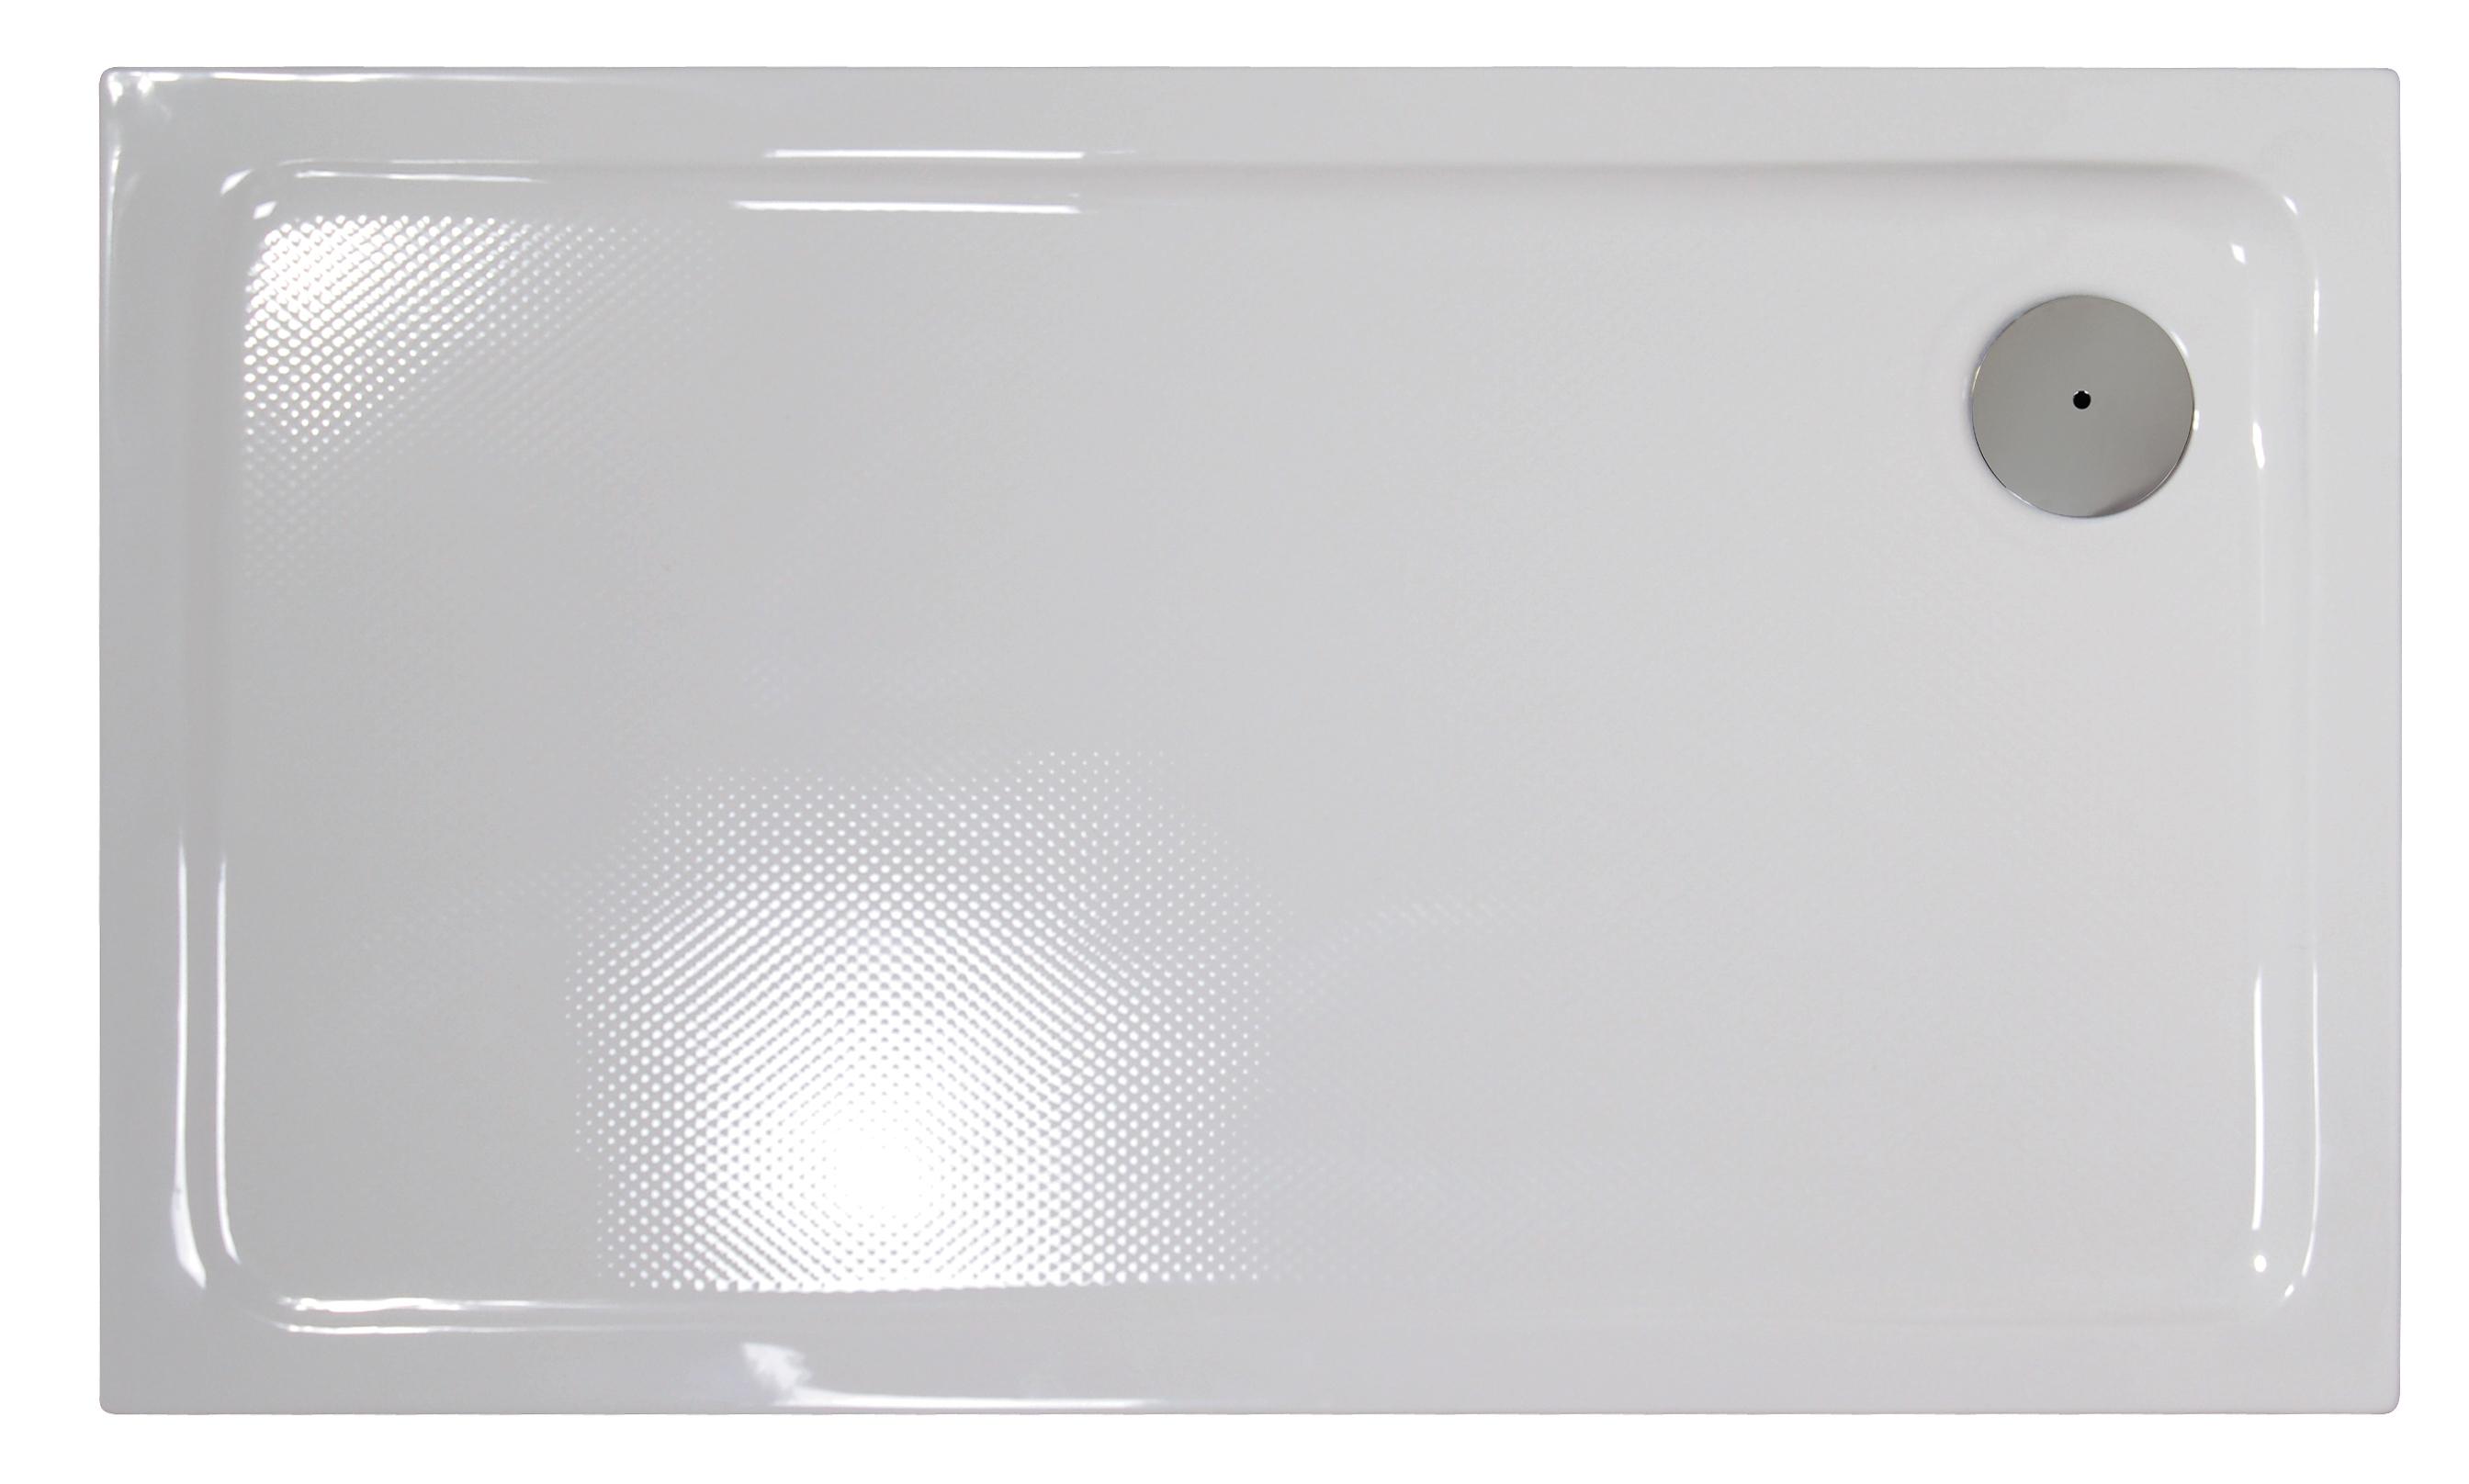 Urban Low Profile Rectangular Shower Tray - Notjusttaps.co.uk